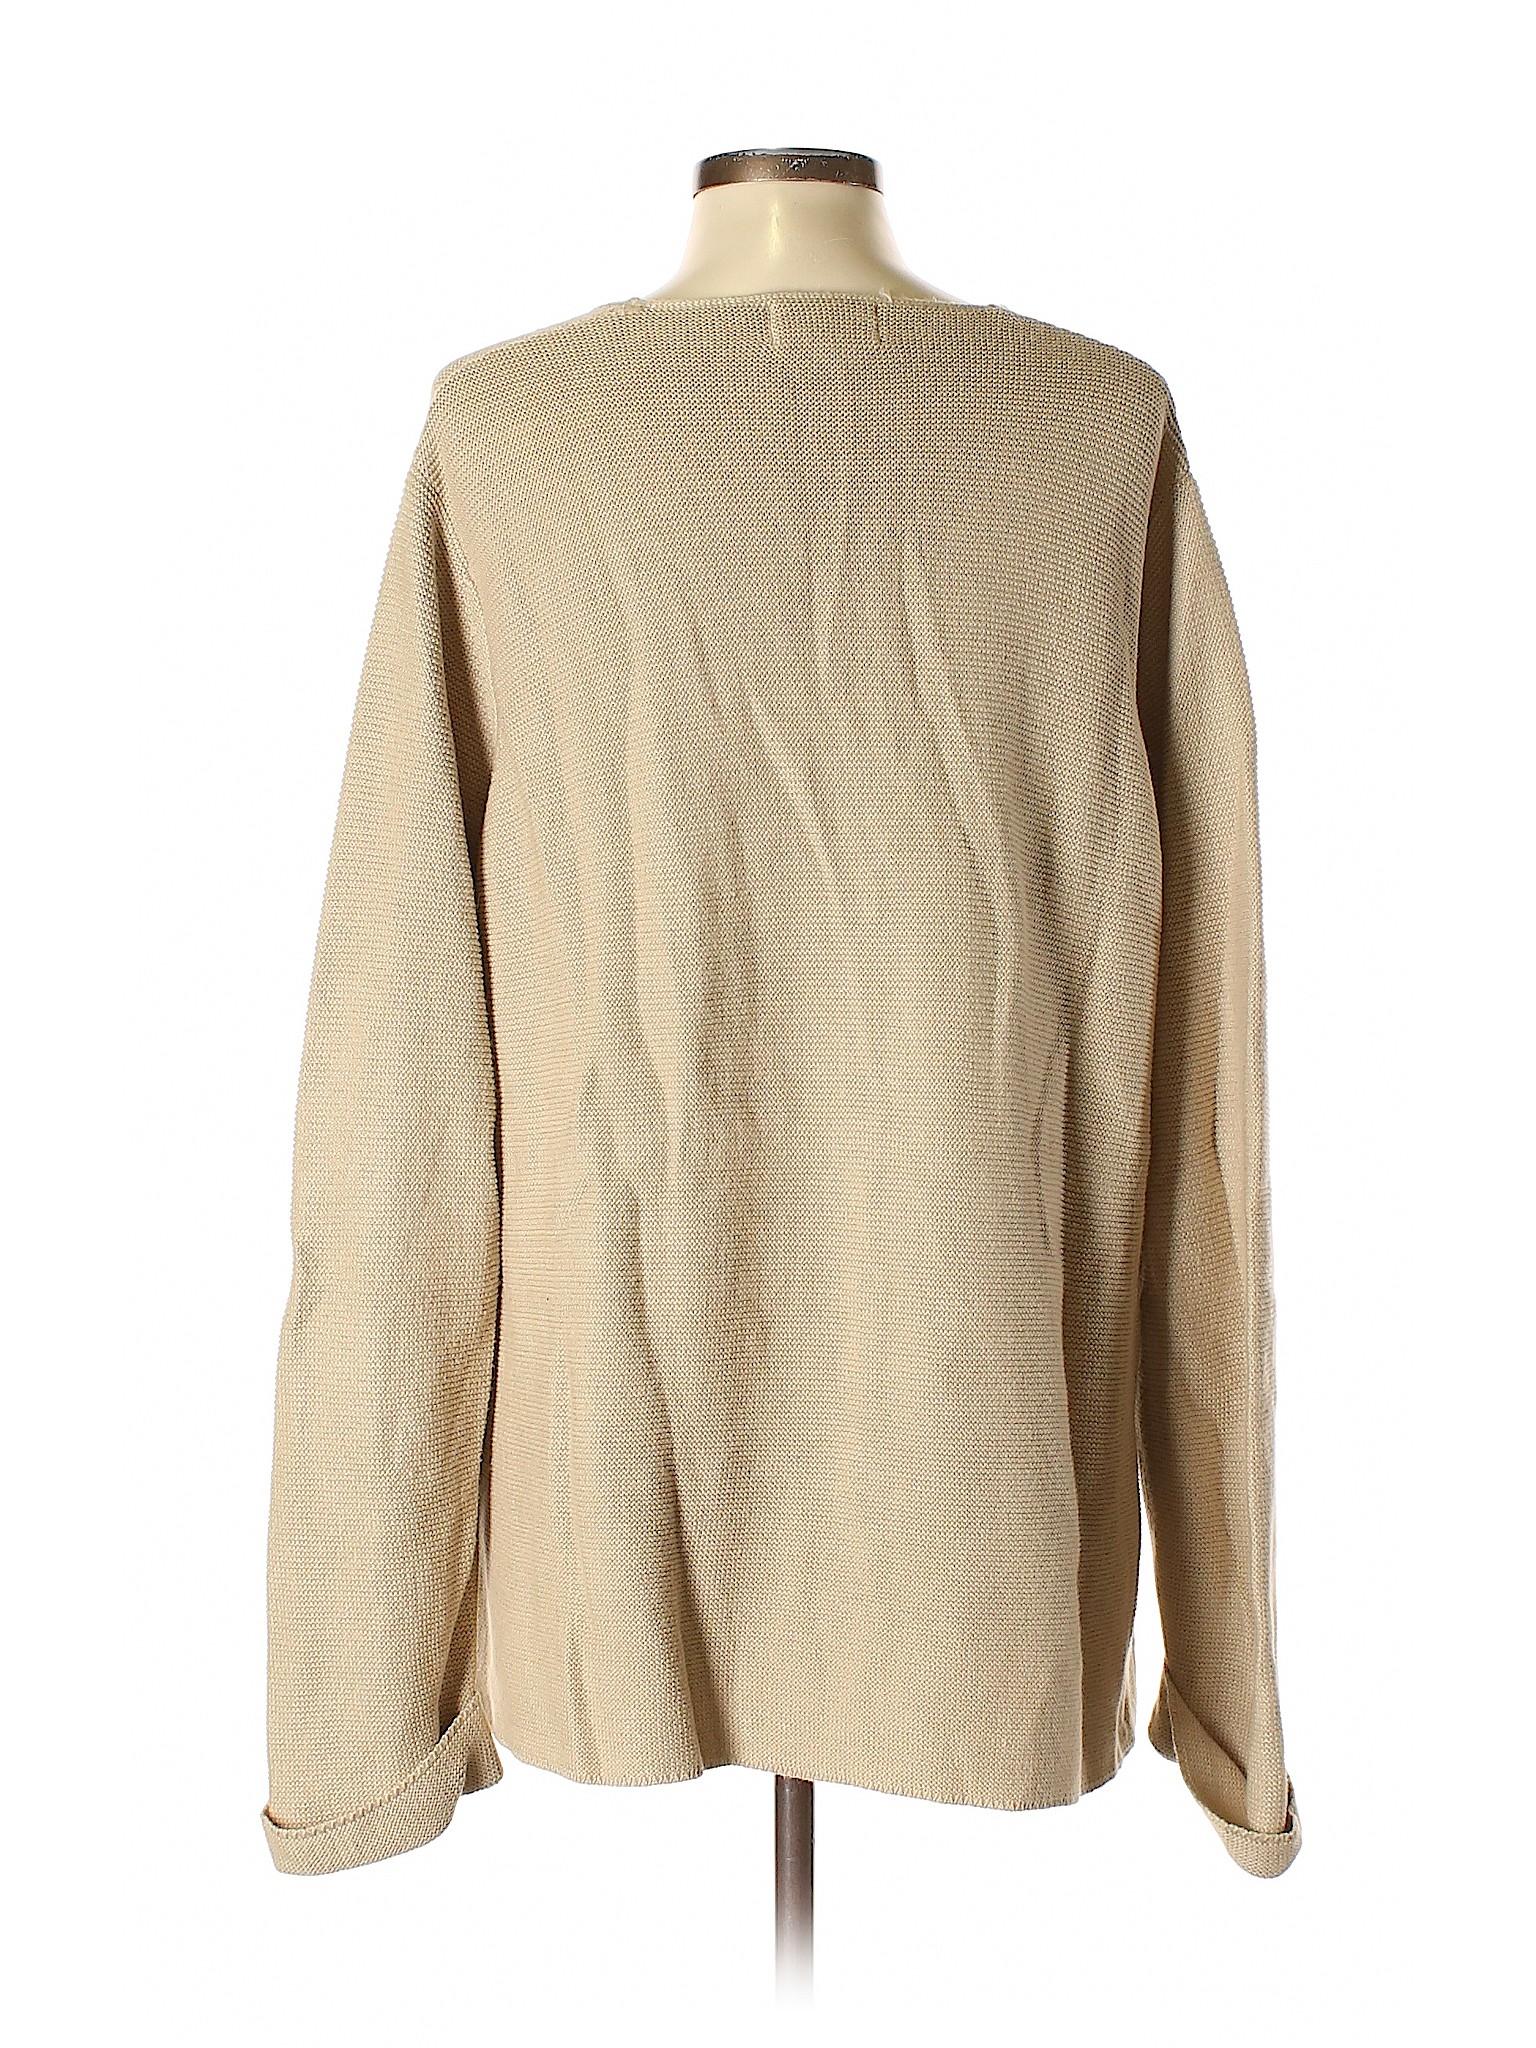 Company Monterey Clothing Bay Boutique Cardigan AaPqfxvwnw